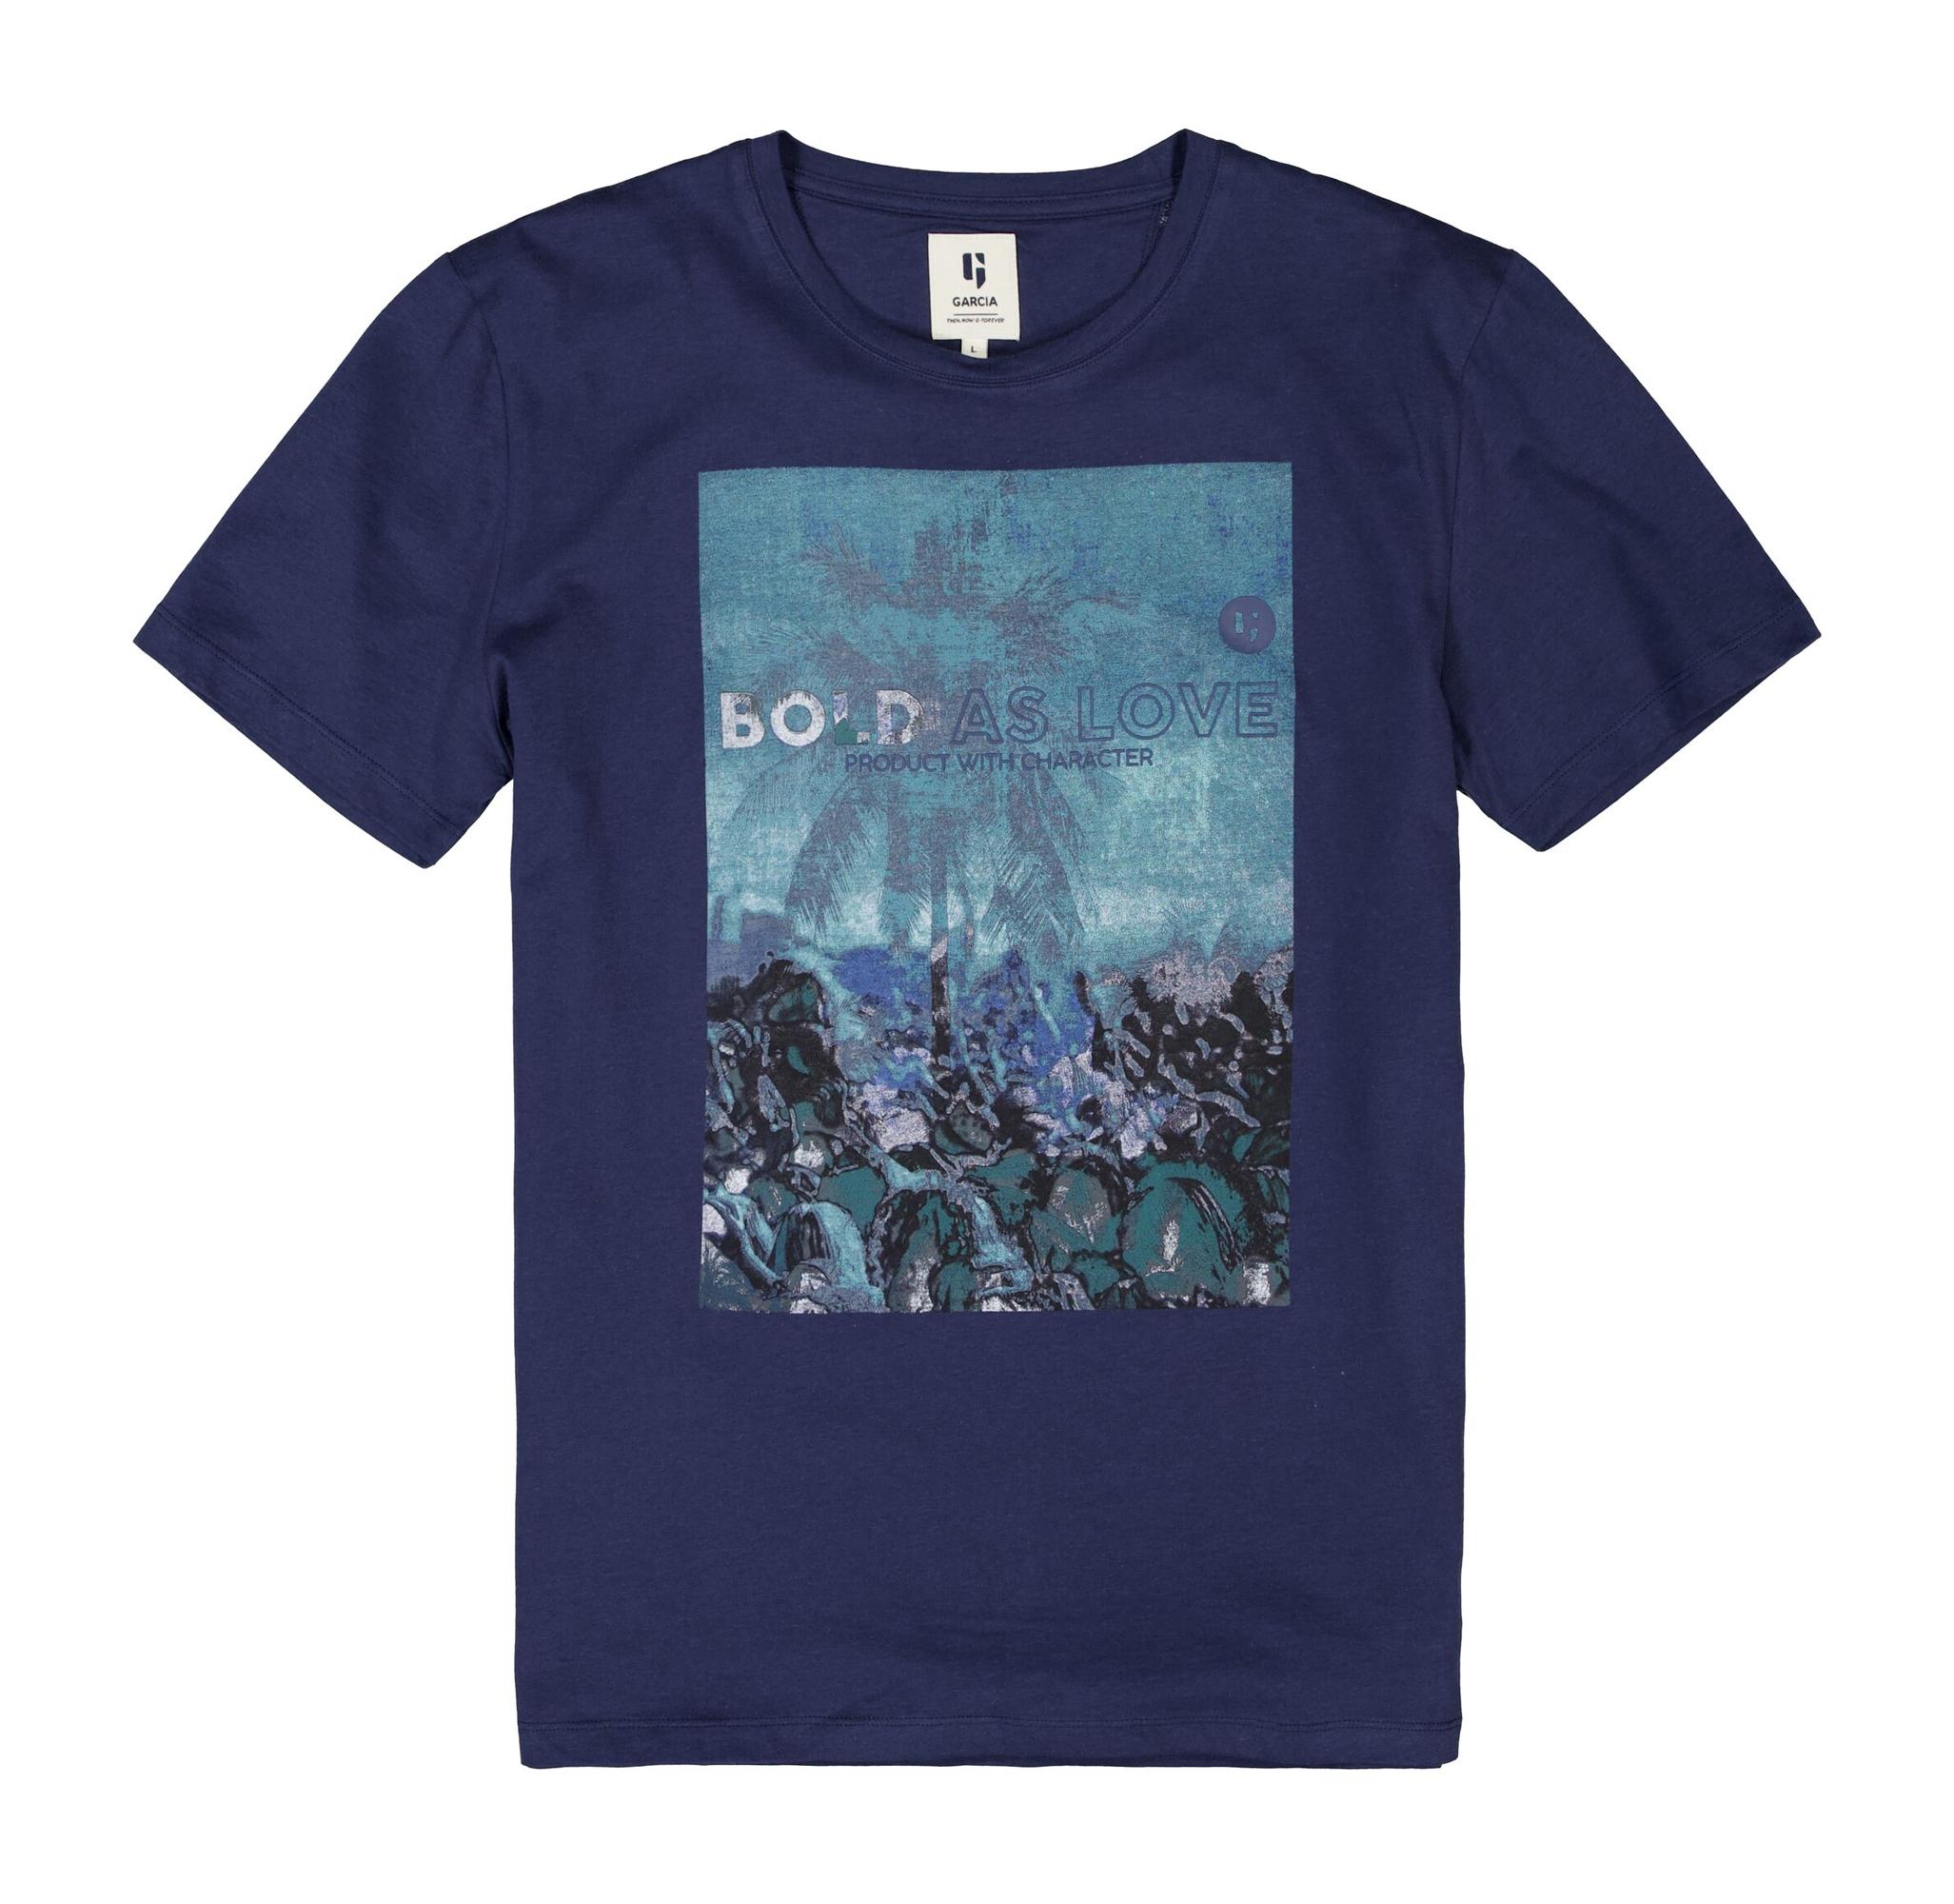 Garcia Herren T-Shirt Shirt kurzarm blau E11002 4962 denim blue